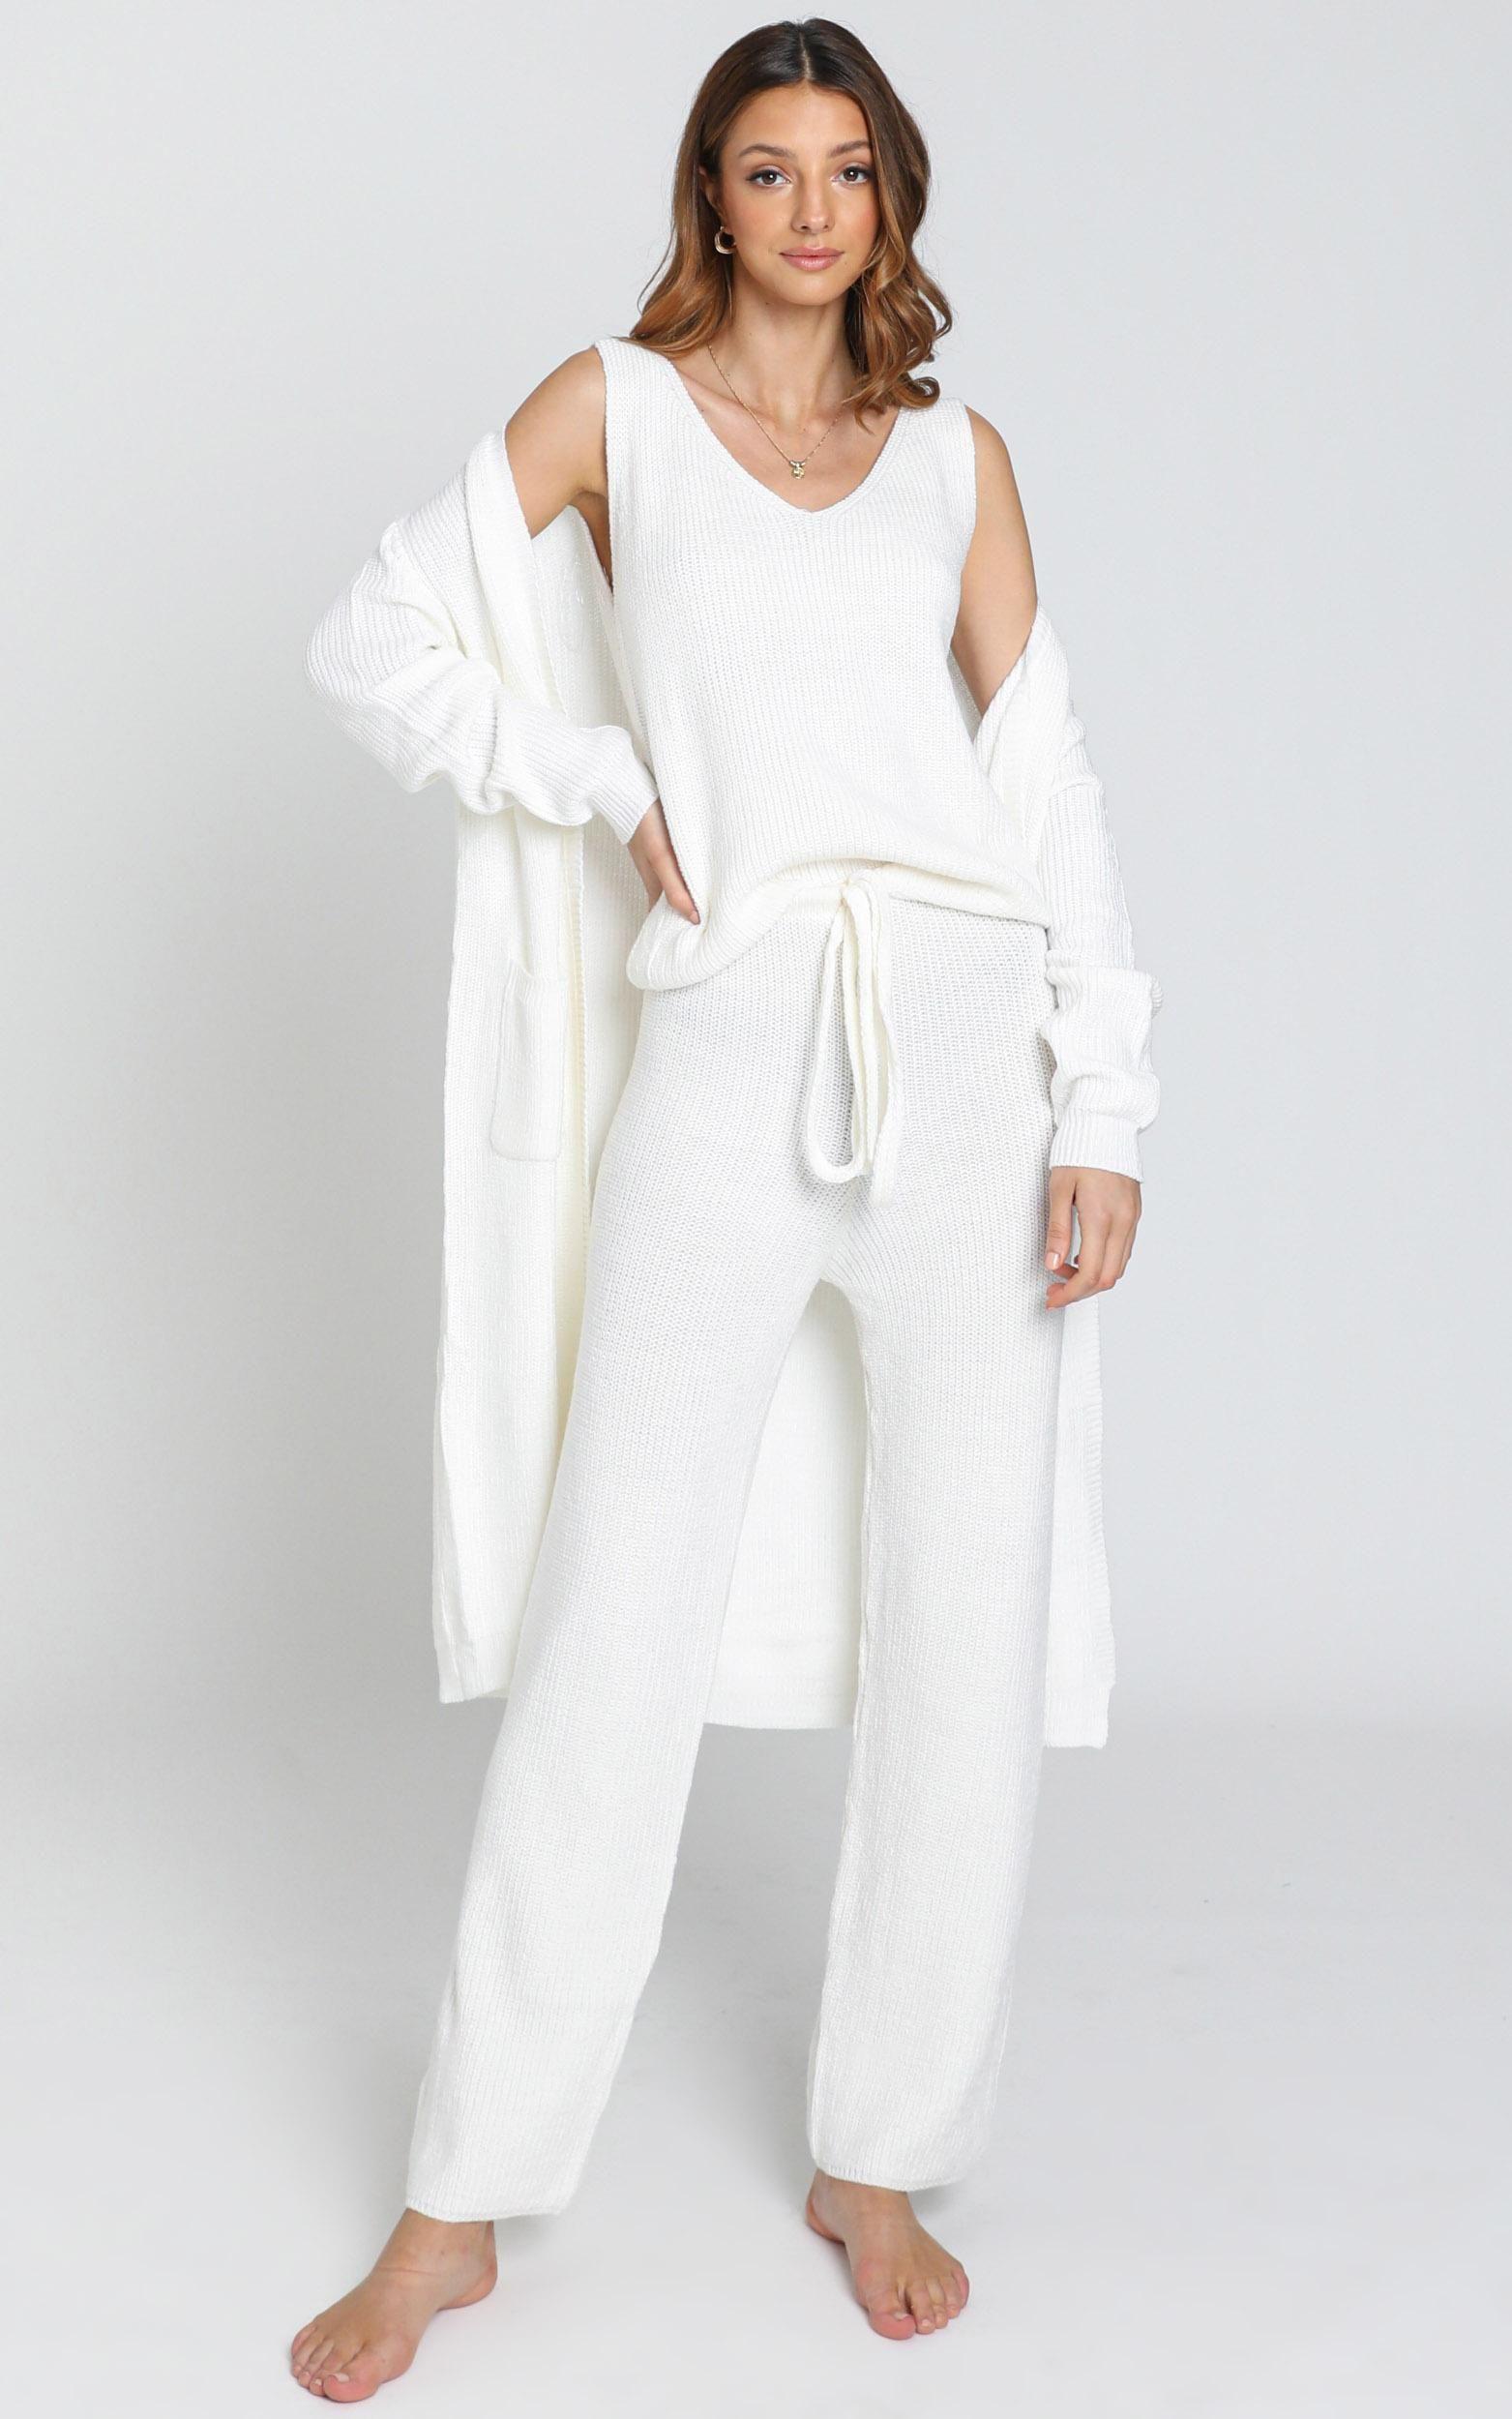 Luxe Lounge Knit Cardigan In Cream Showpo Lounge Wear Stylish Luxe Lounge Lounge Wear [ 2500 x 1563 Pixel ]